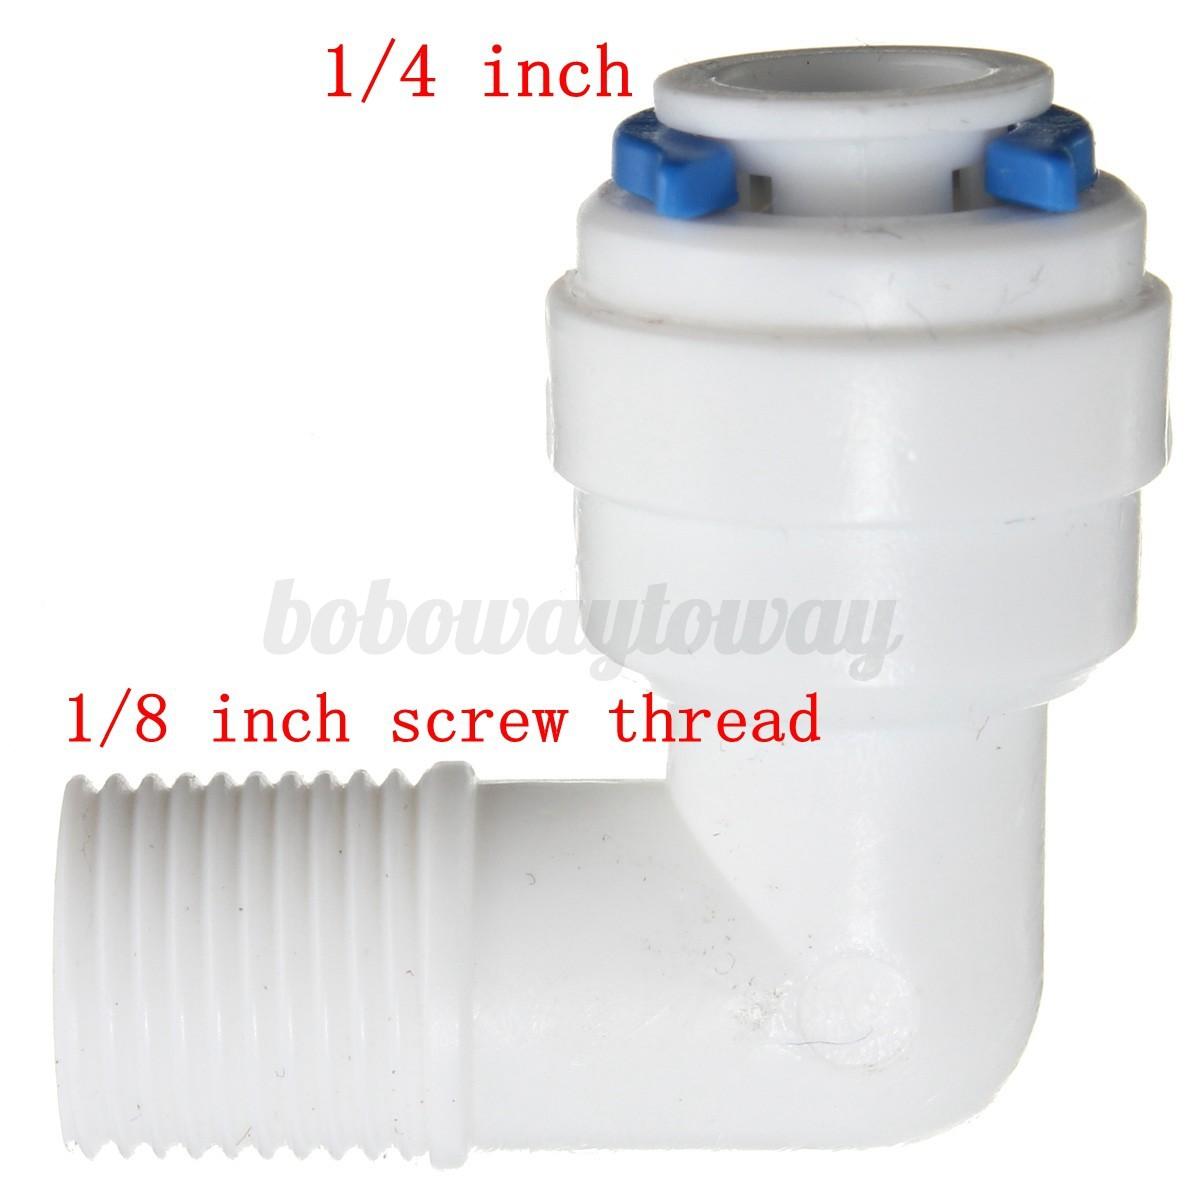 1 4 39 39 kunststoff verschraubung fittings f r wasserfilter klemmfitting verbinder ebay. Black Bedroom Furniture Sets. Home Design Ideas